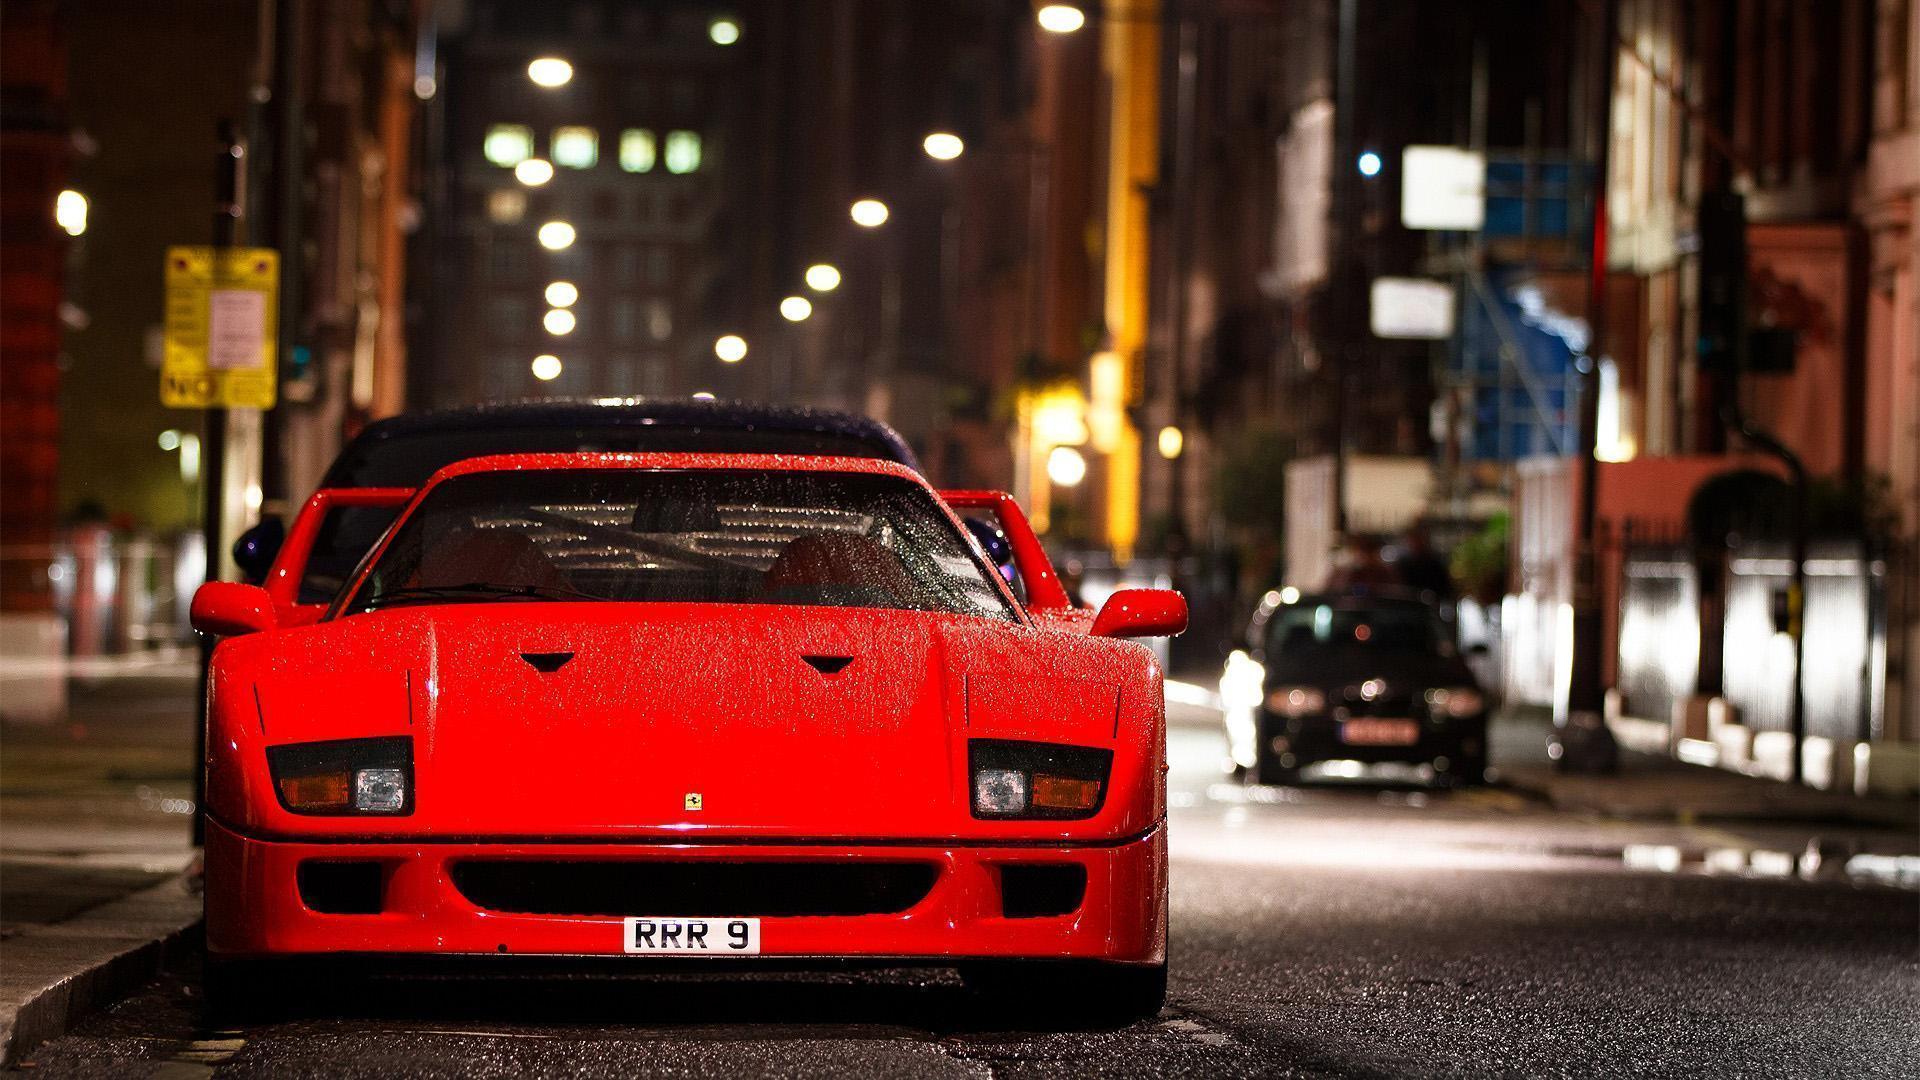 Ferrari F40 Wallpapers Top Free Ferrari F40 Backgrounds Wallpaperaccess